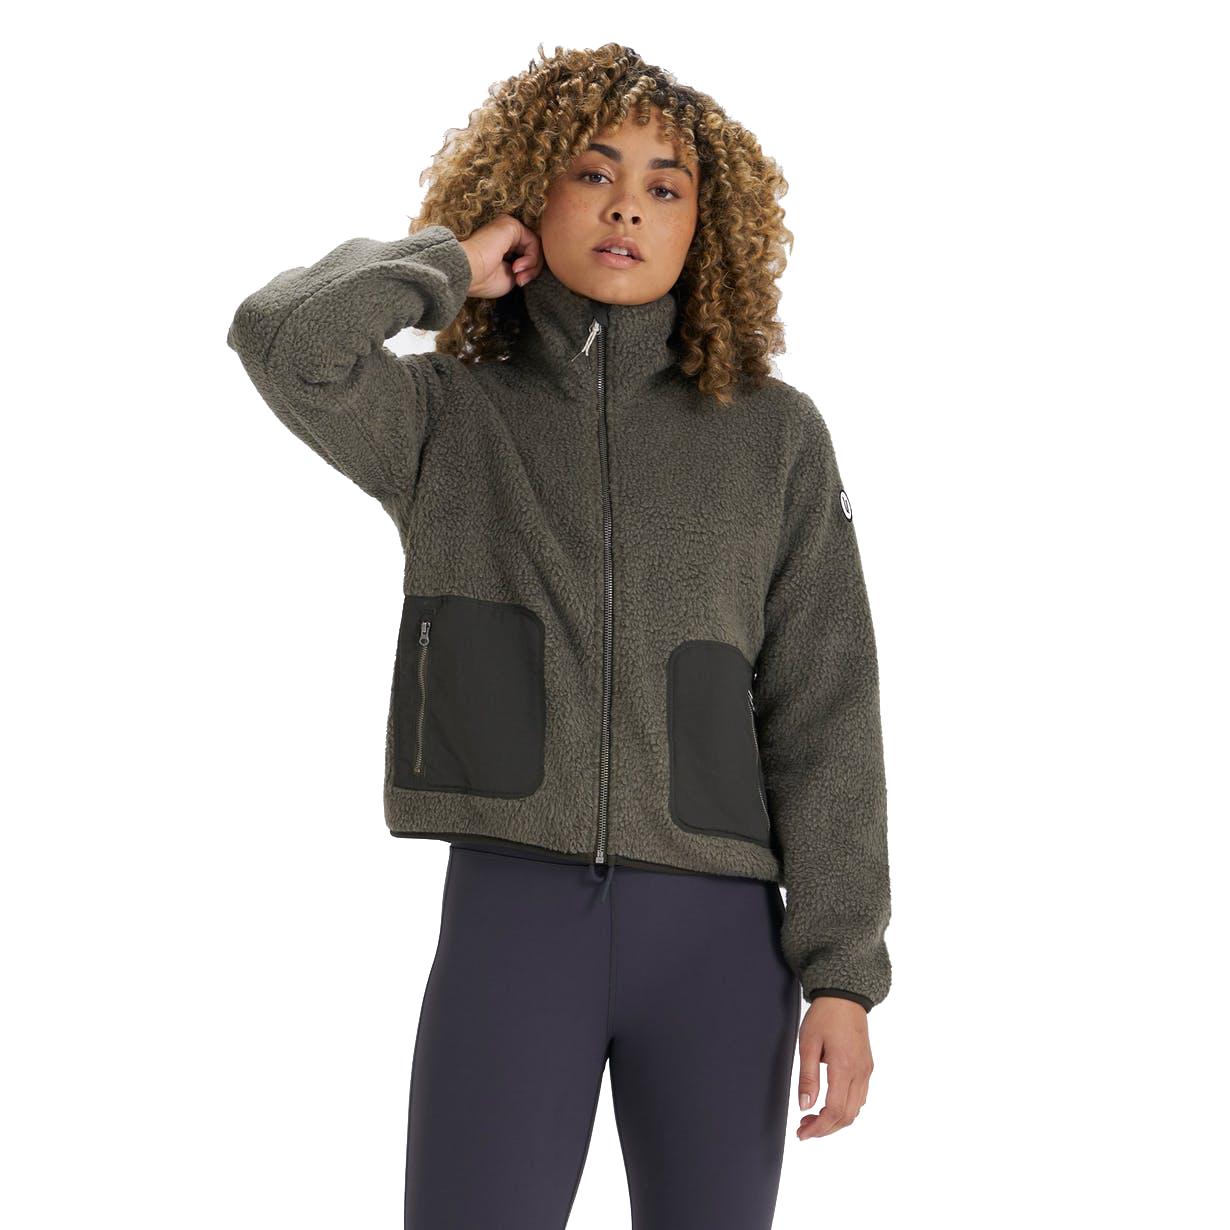 Read more about the article Vuori – Women's Alpine Sherpa Jacket